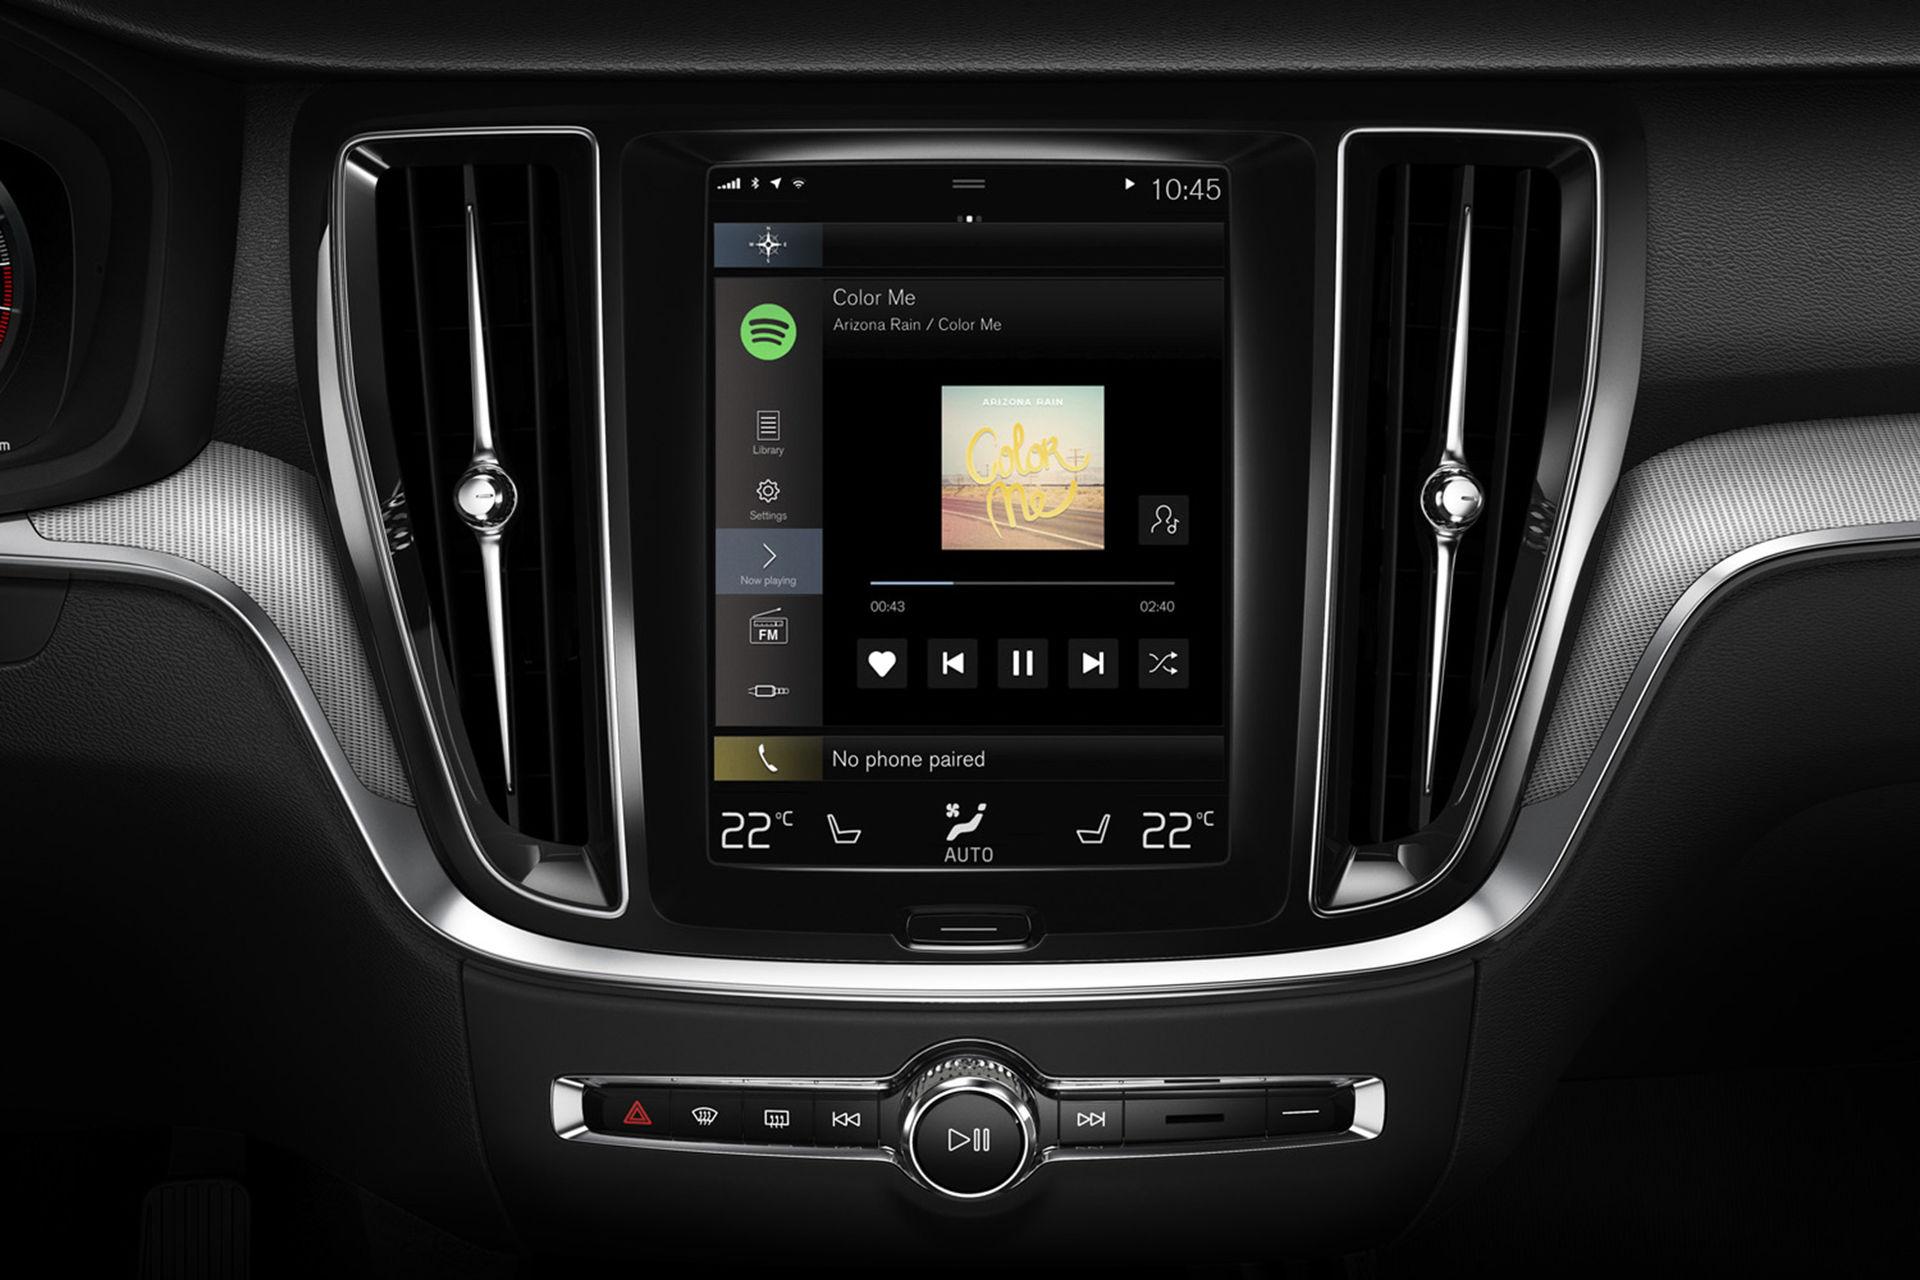 Ny design på Spotify i Volvos bilar